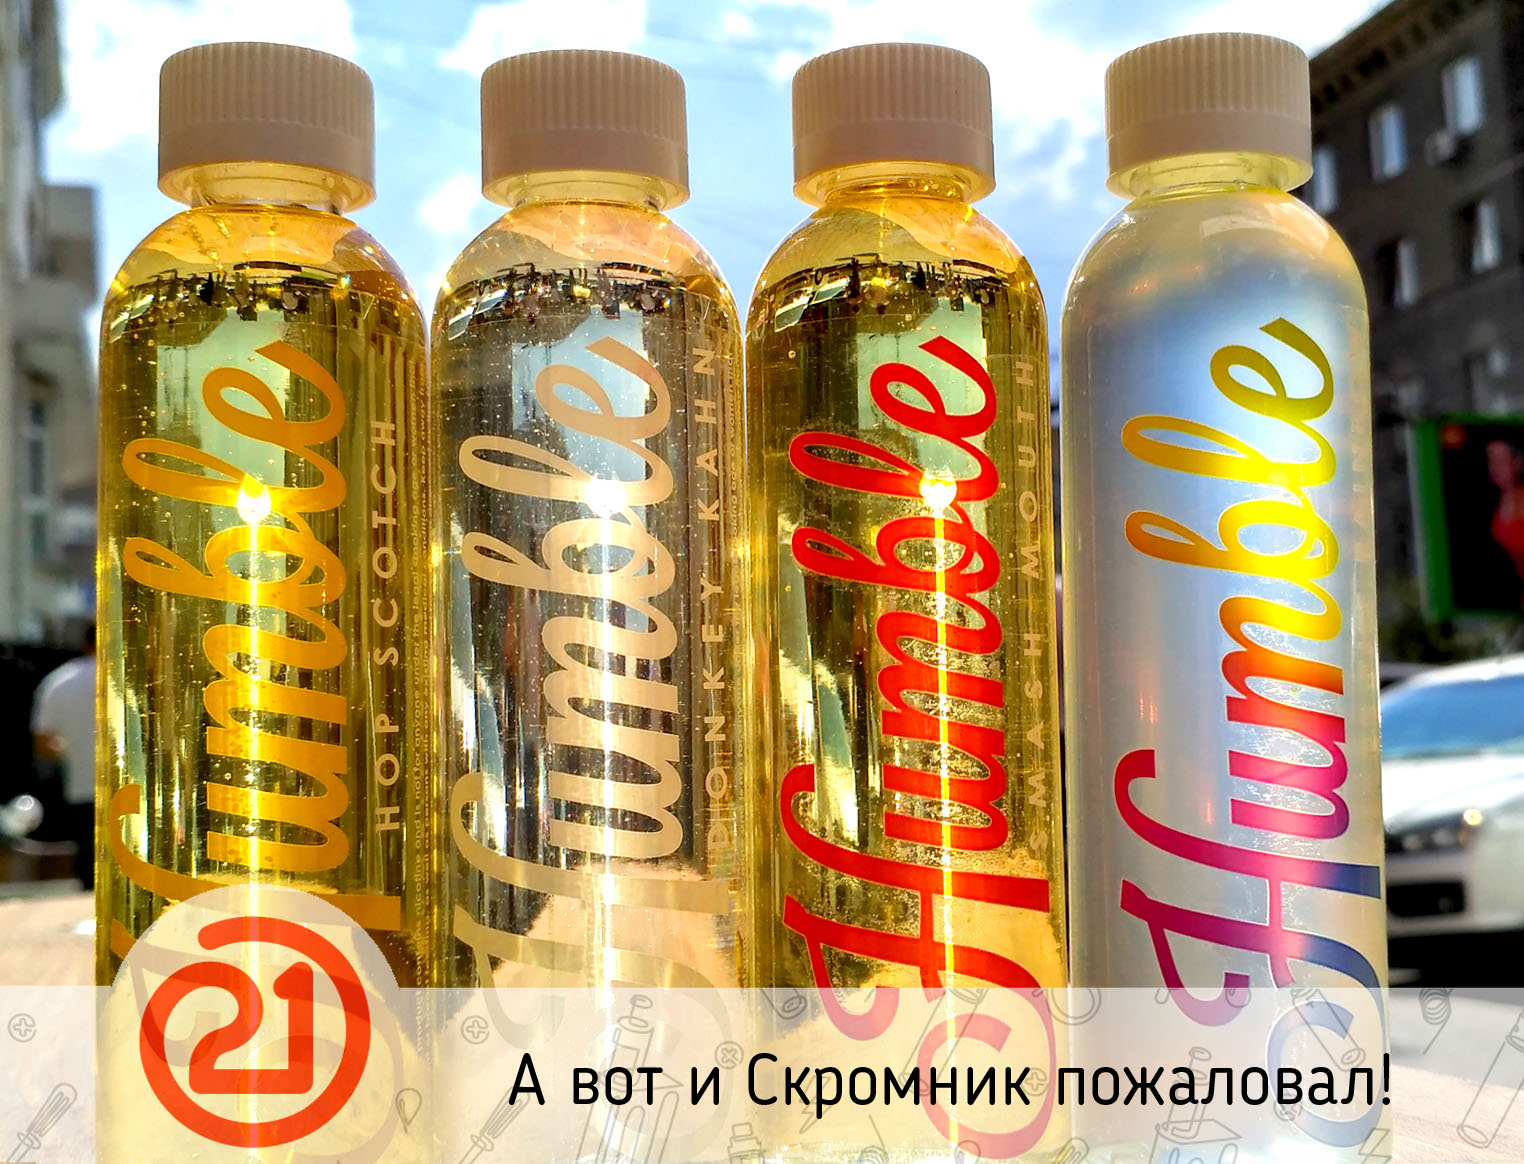 vp21-ru-zhidkosti-humble-2.jpg